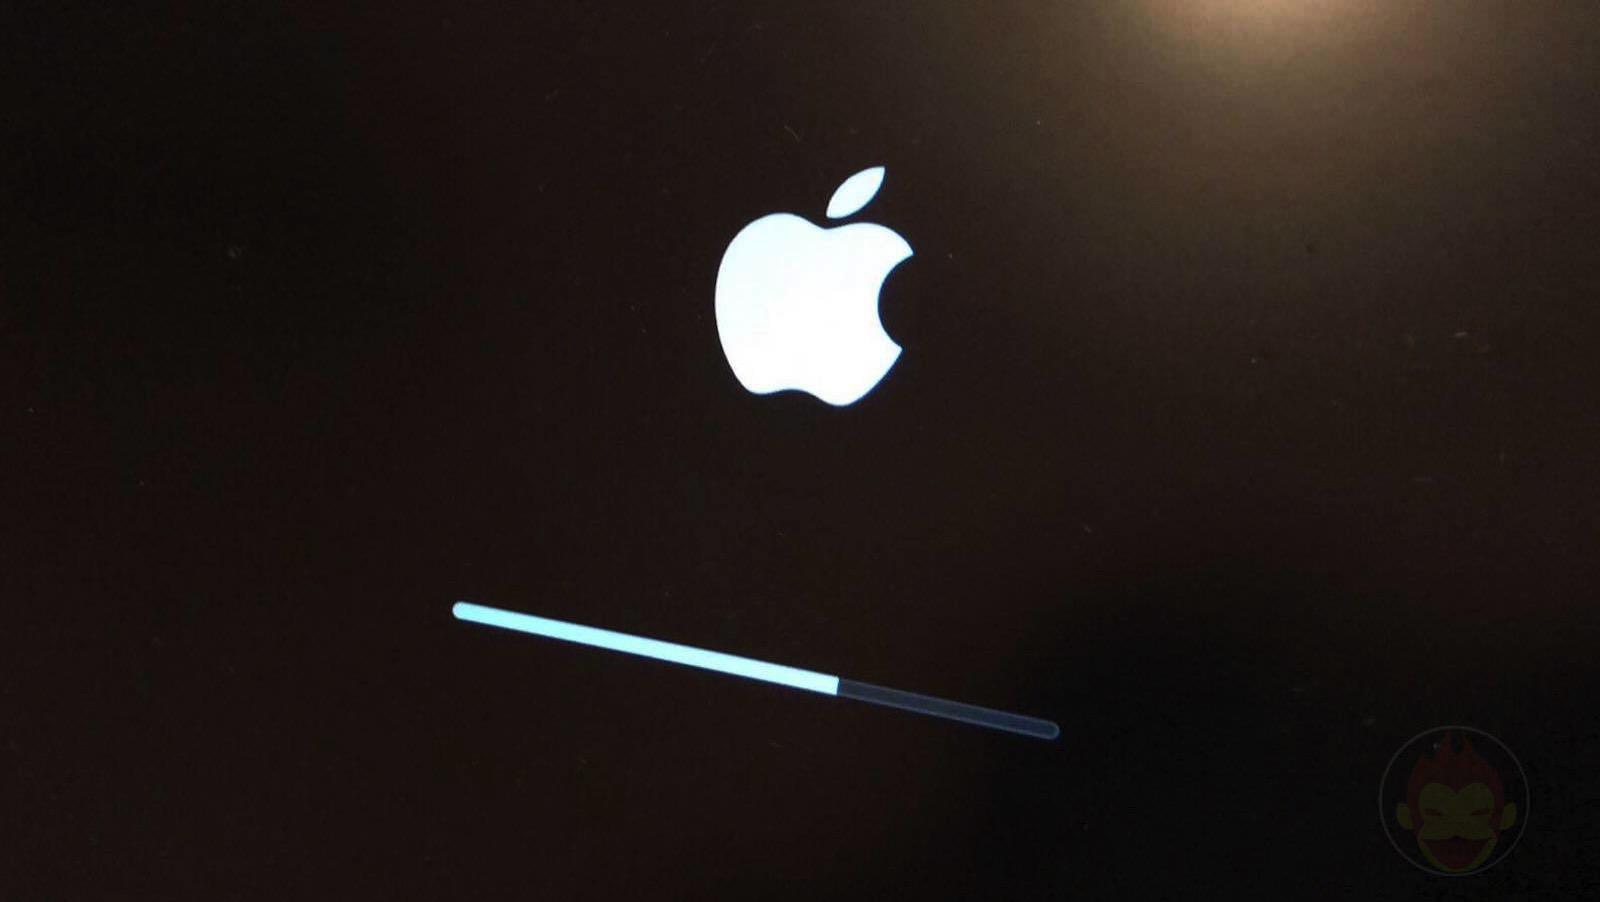 MacBook-Pro-Apple-Logo-Reset-01.jpg